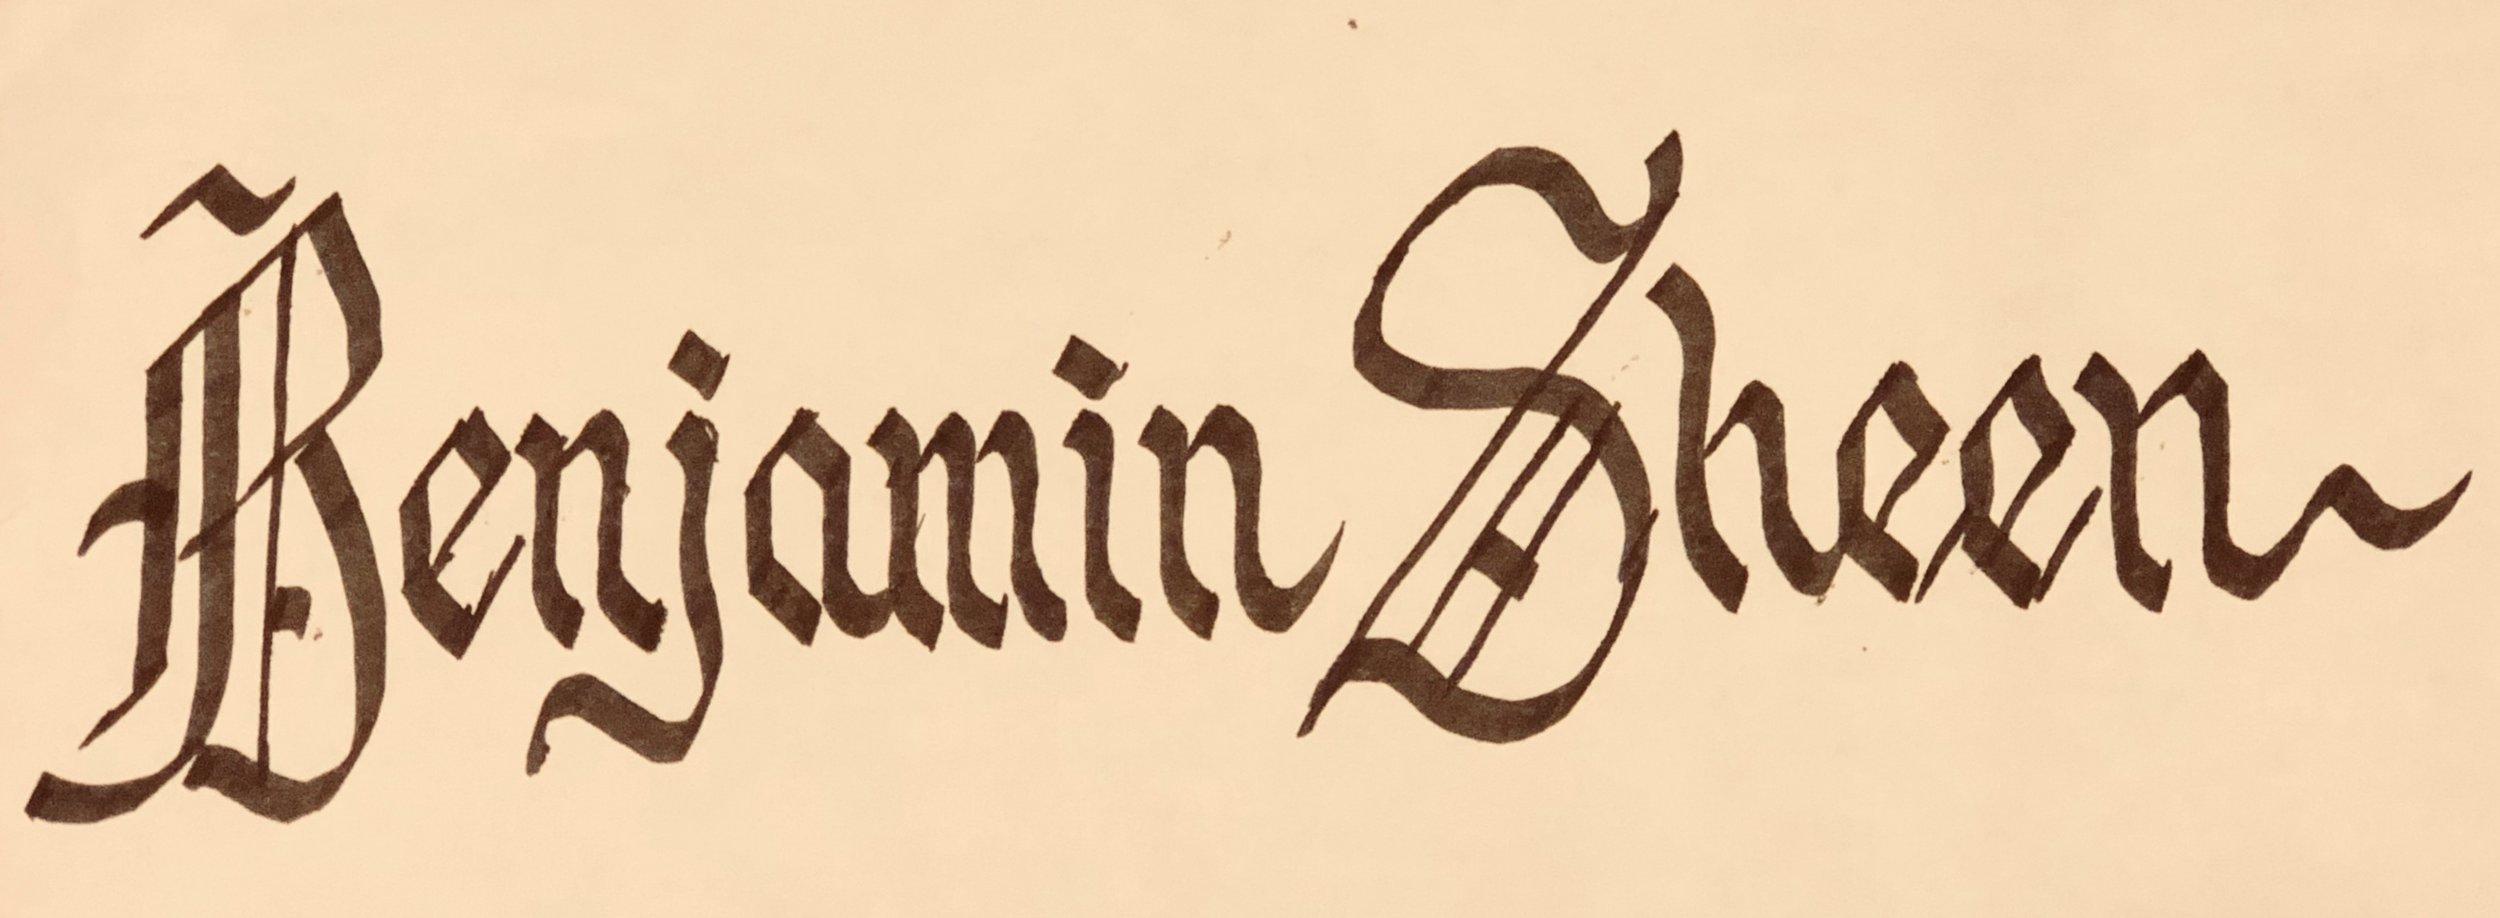 BRS signature caligraphy.jpg